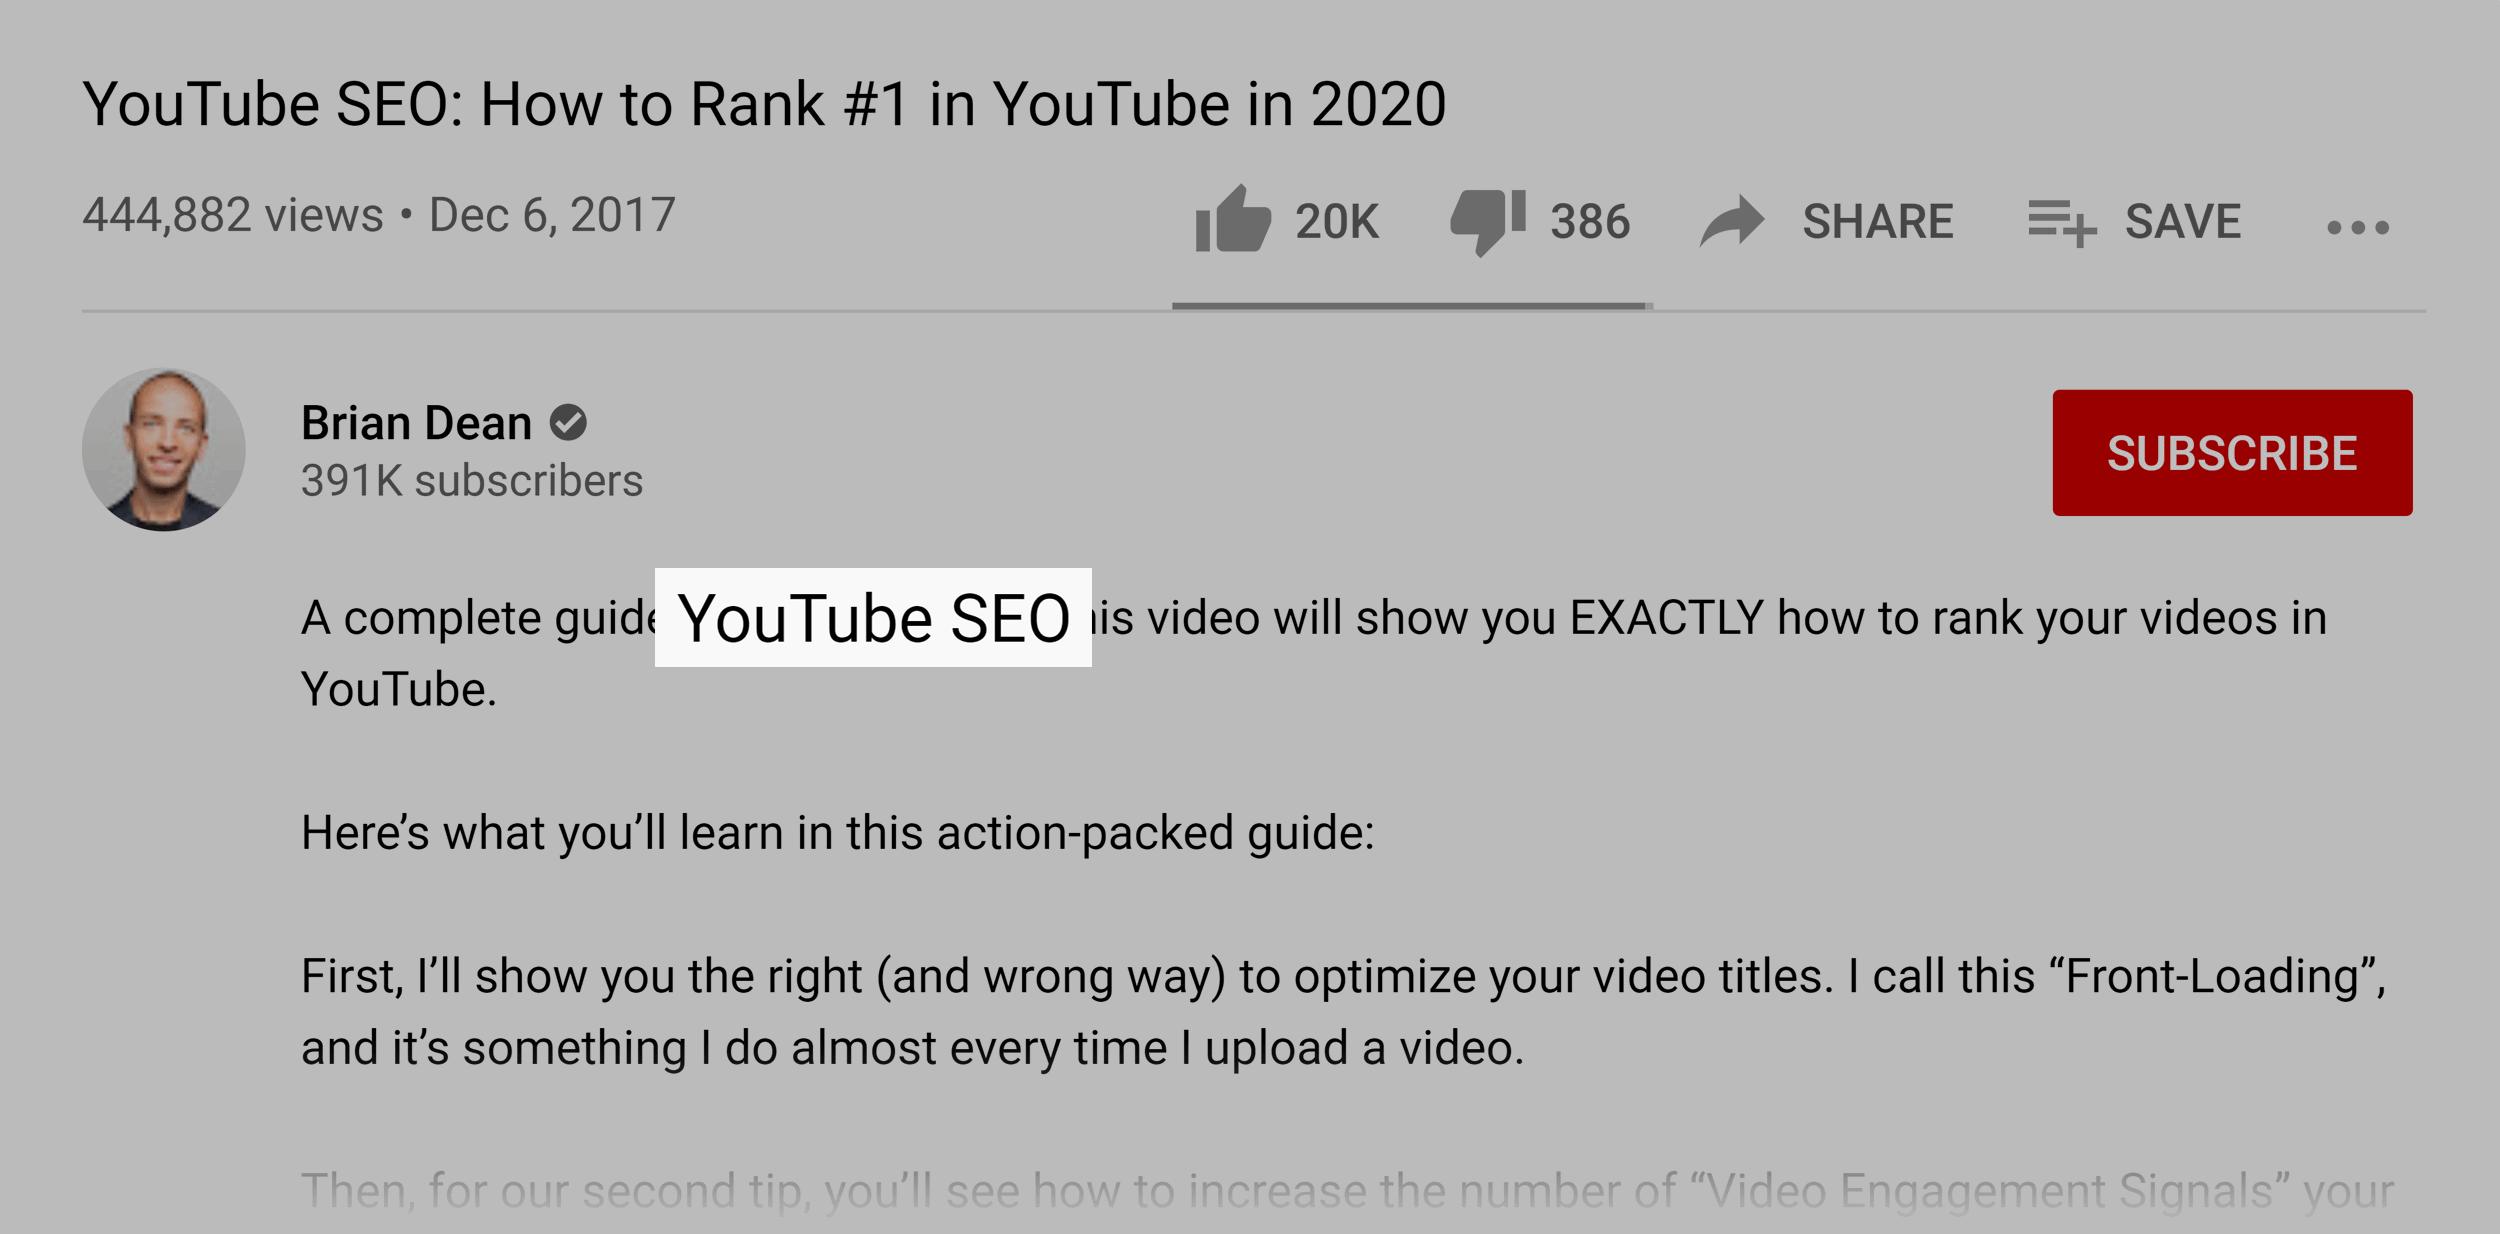 Target keyword in video description